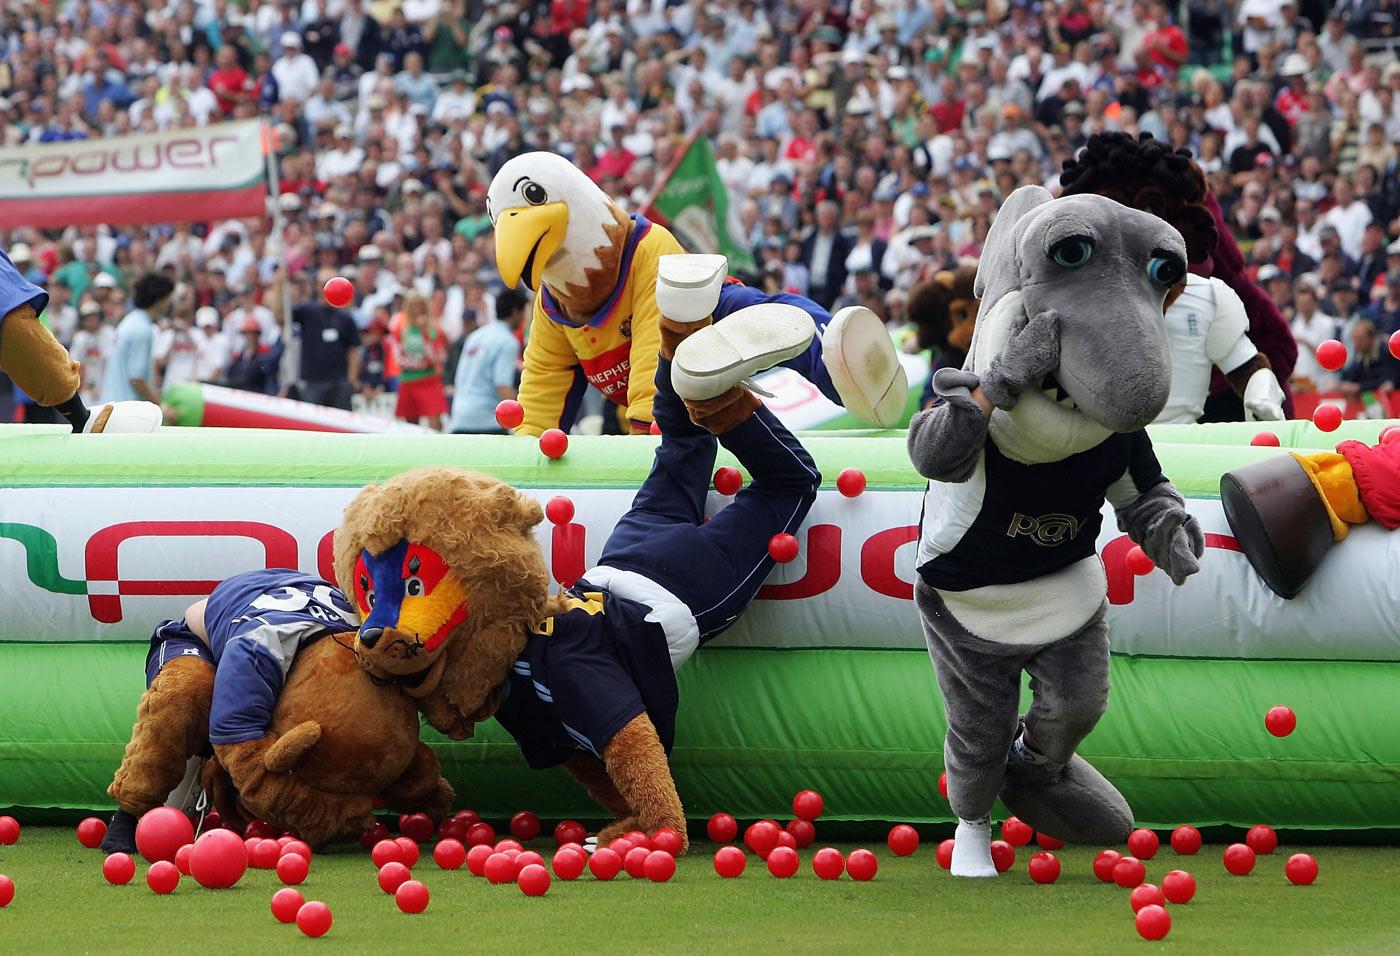 the mascot race on twenty20 finals day cricket photo